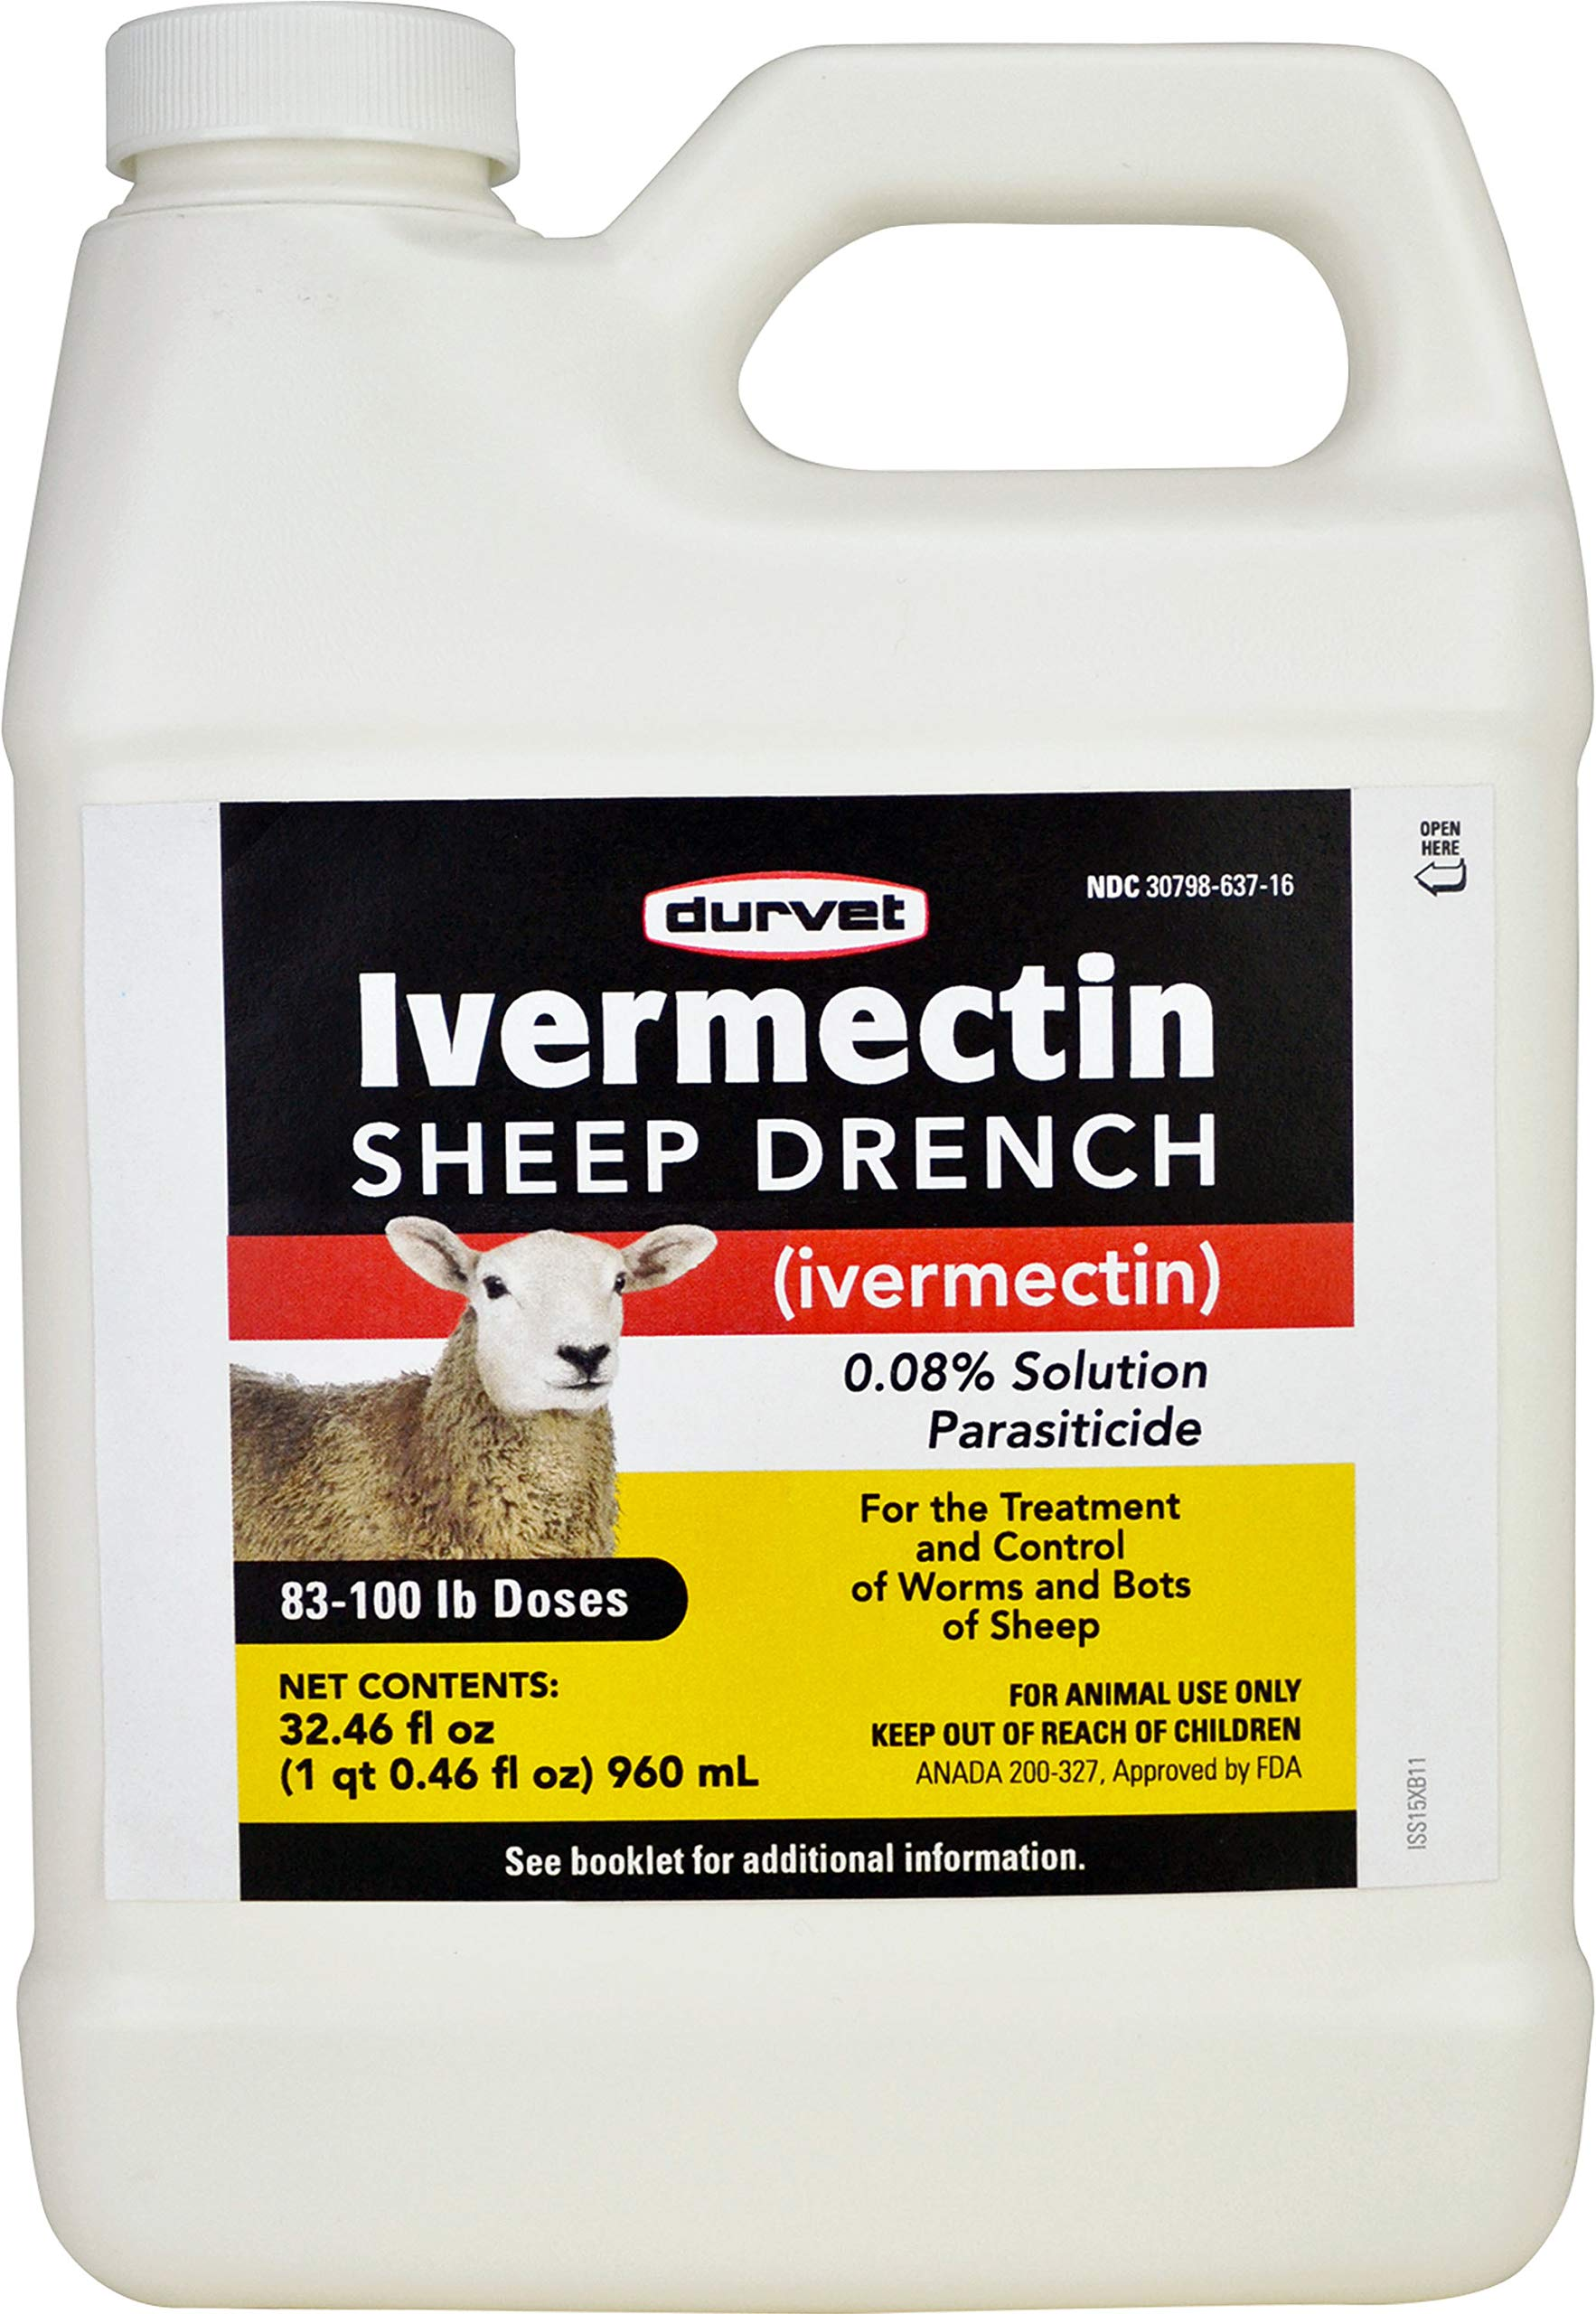 Durvet Ivermectin Sheep Drench by Durvet